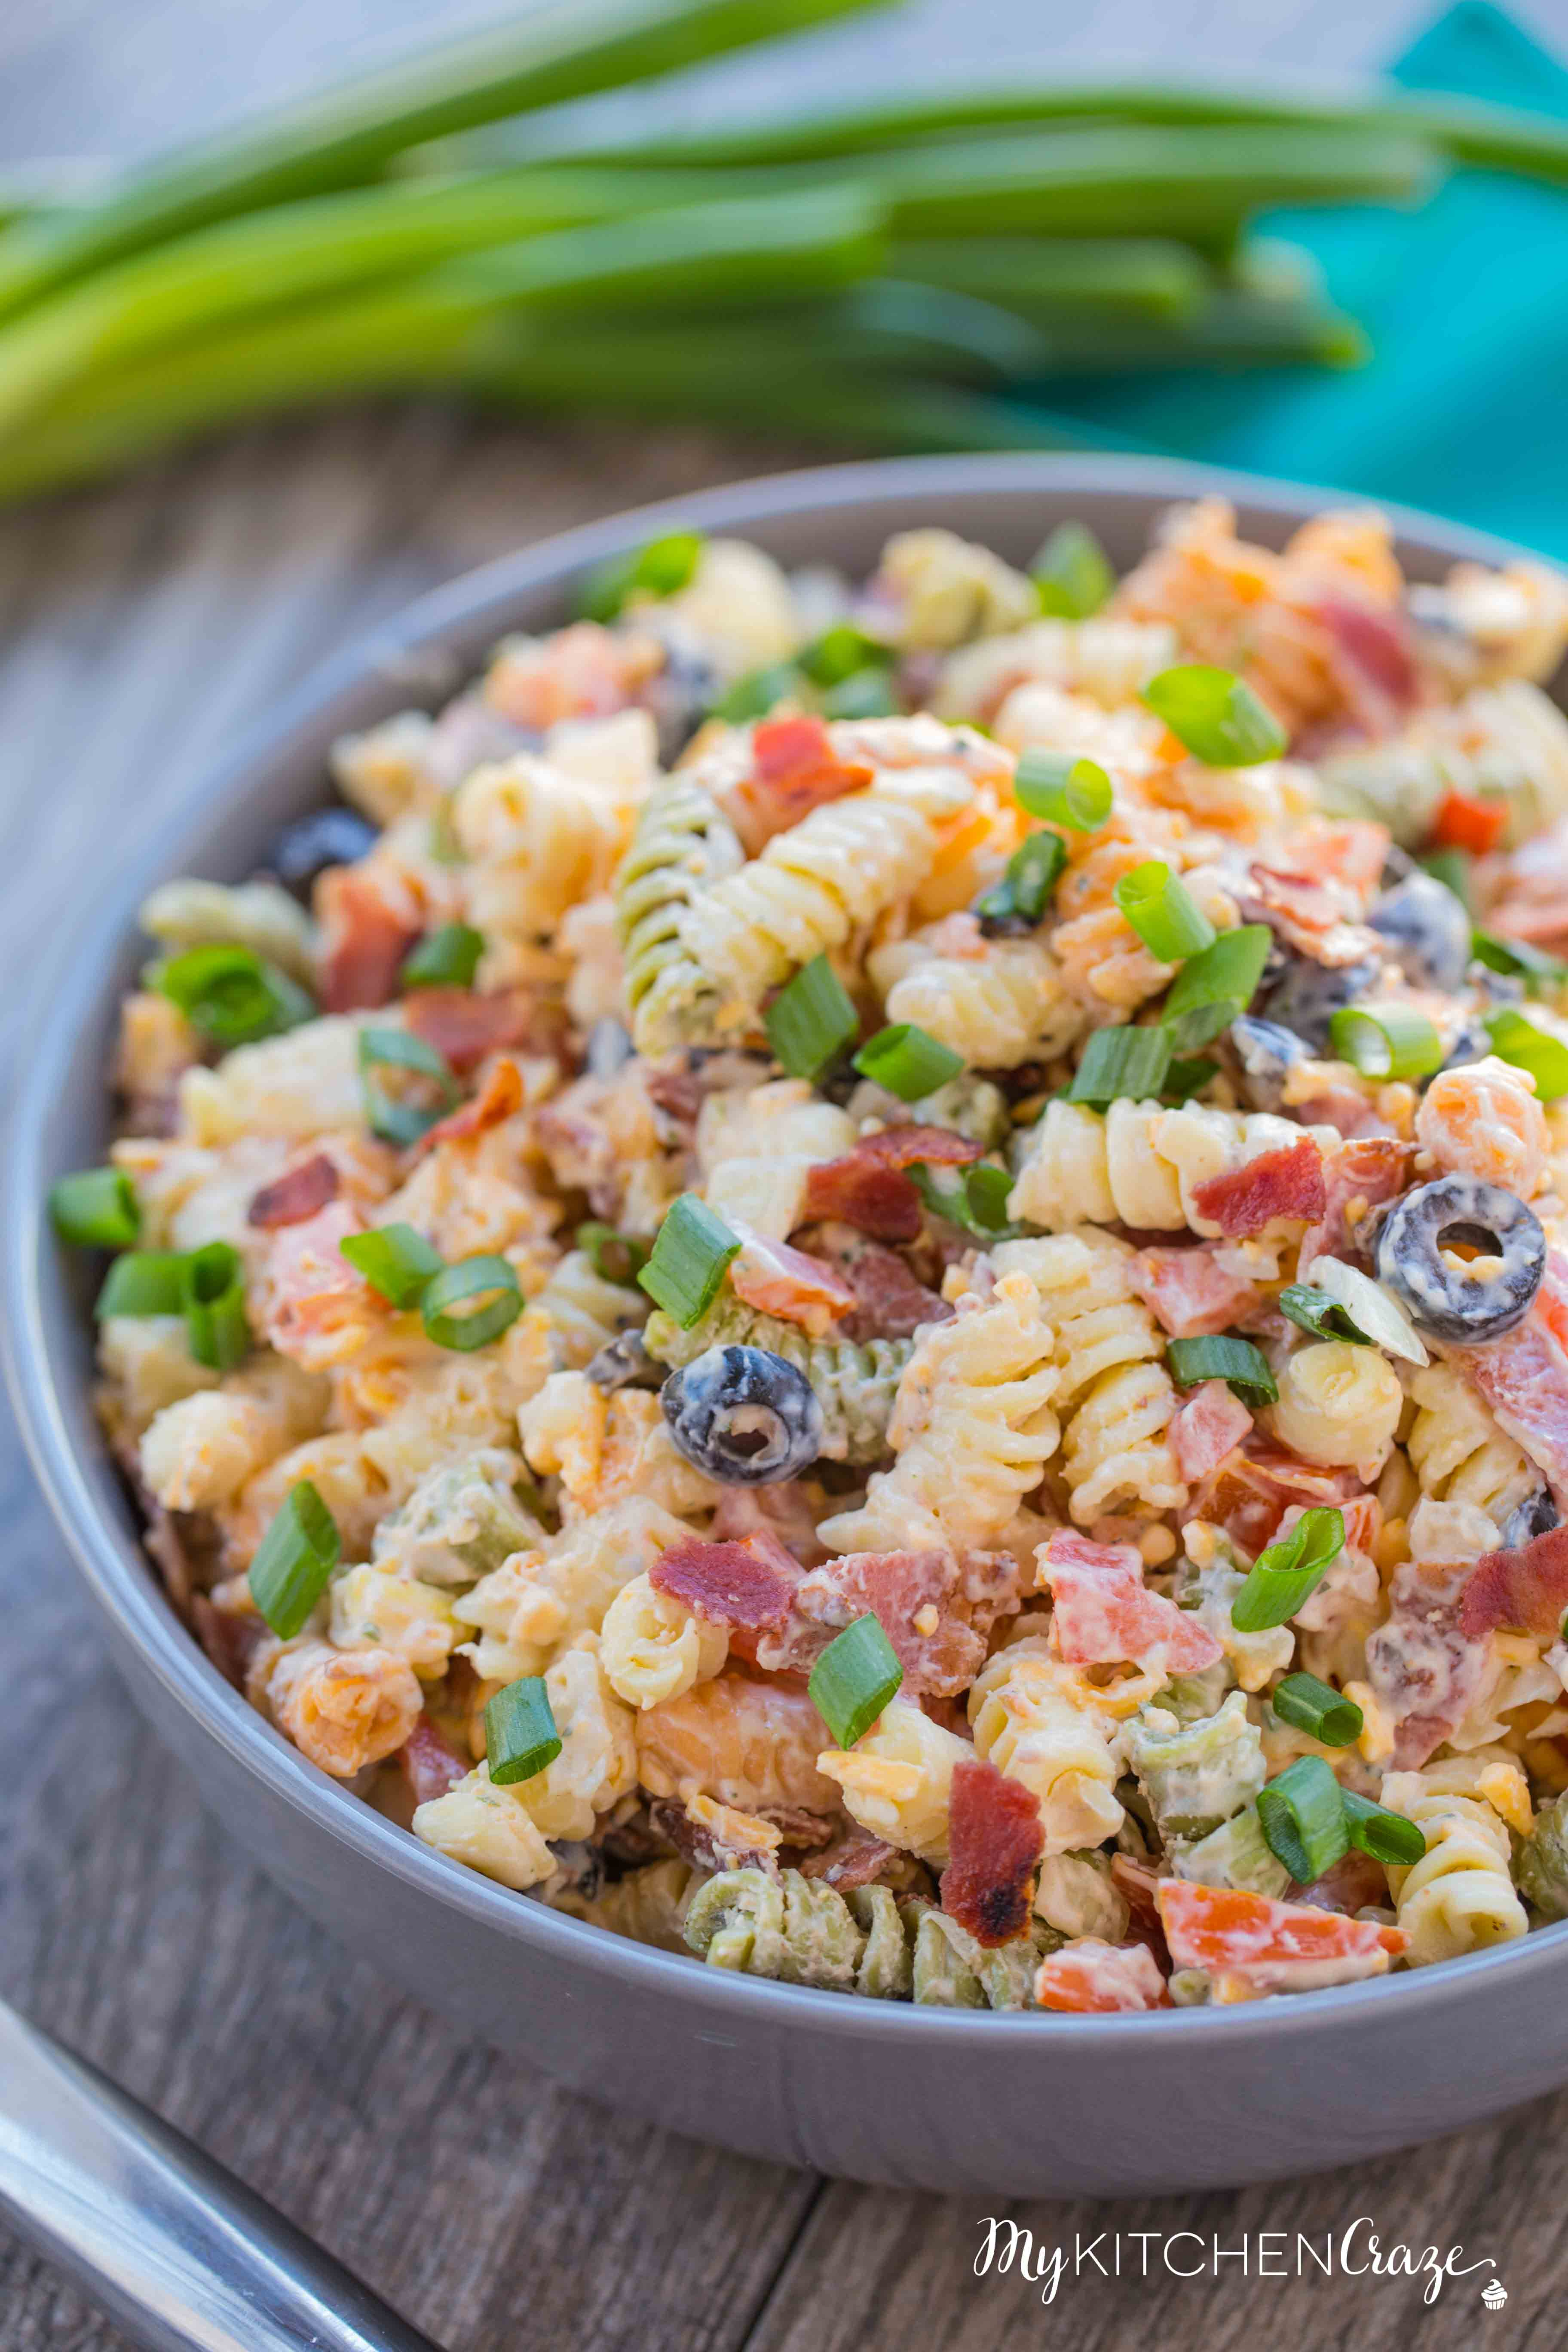 Recipes for bacon ranch pasta salad